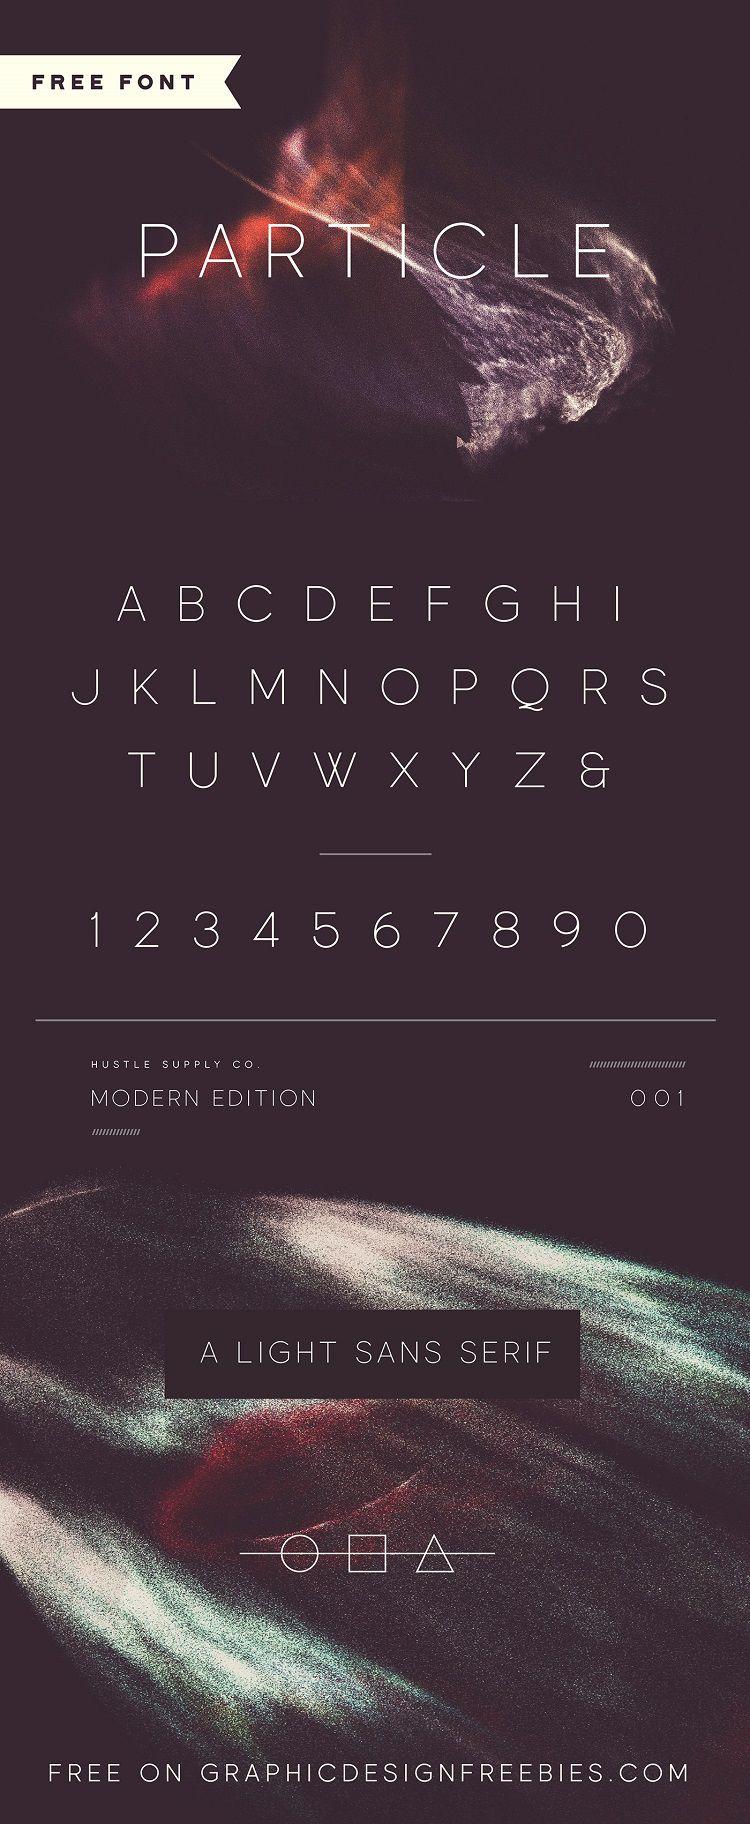 particle-typeface-2